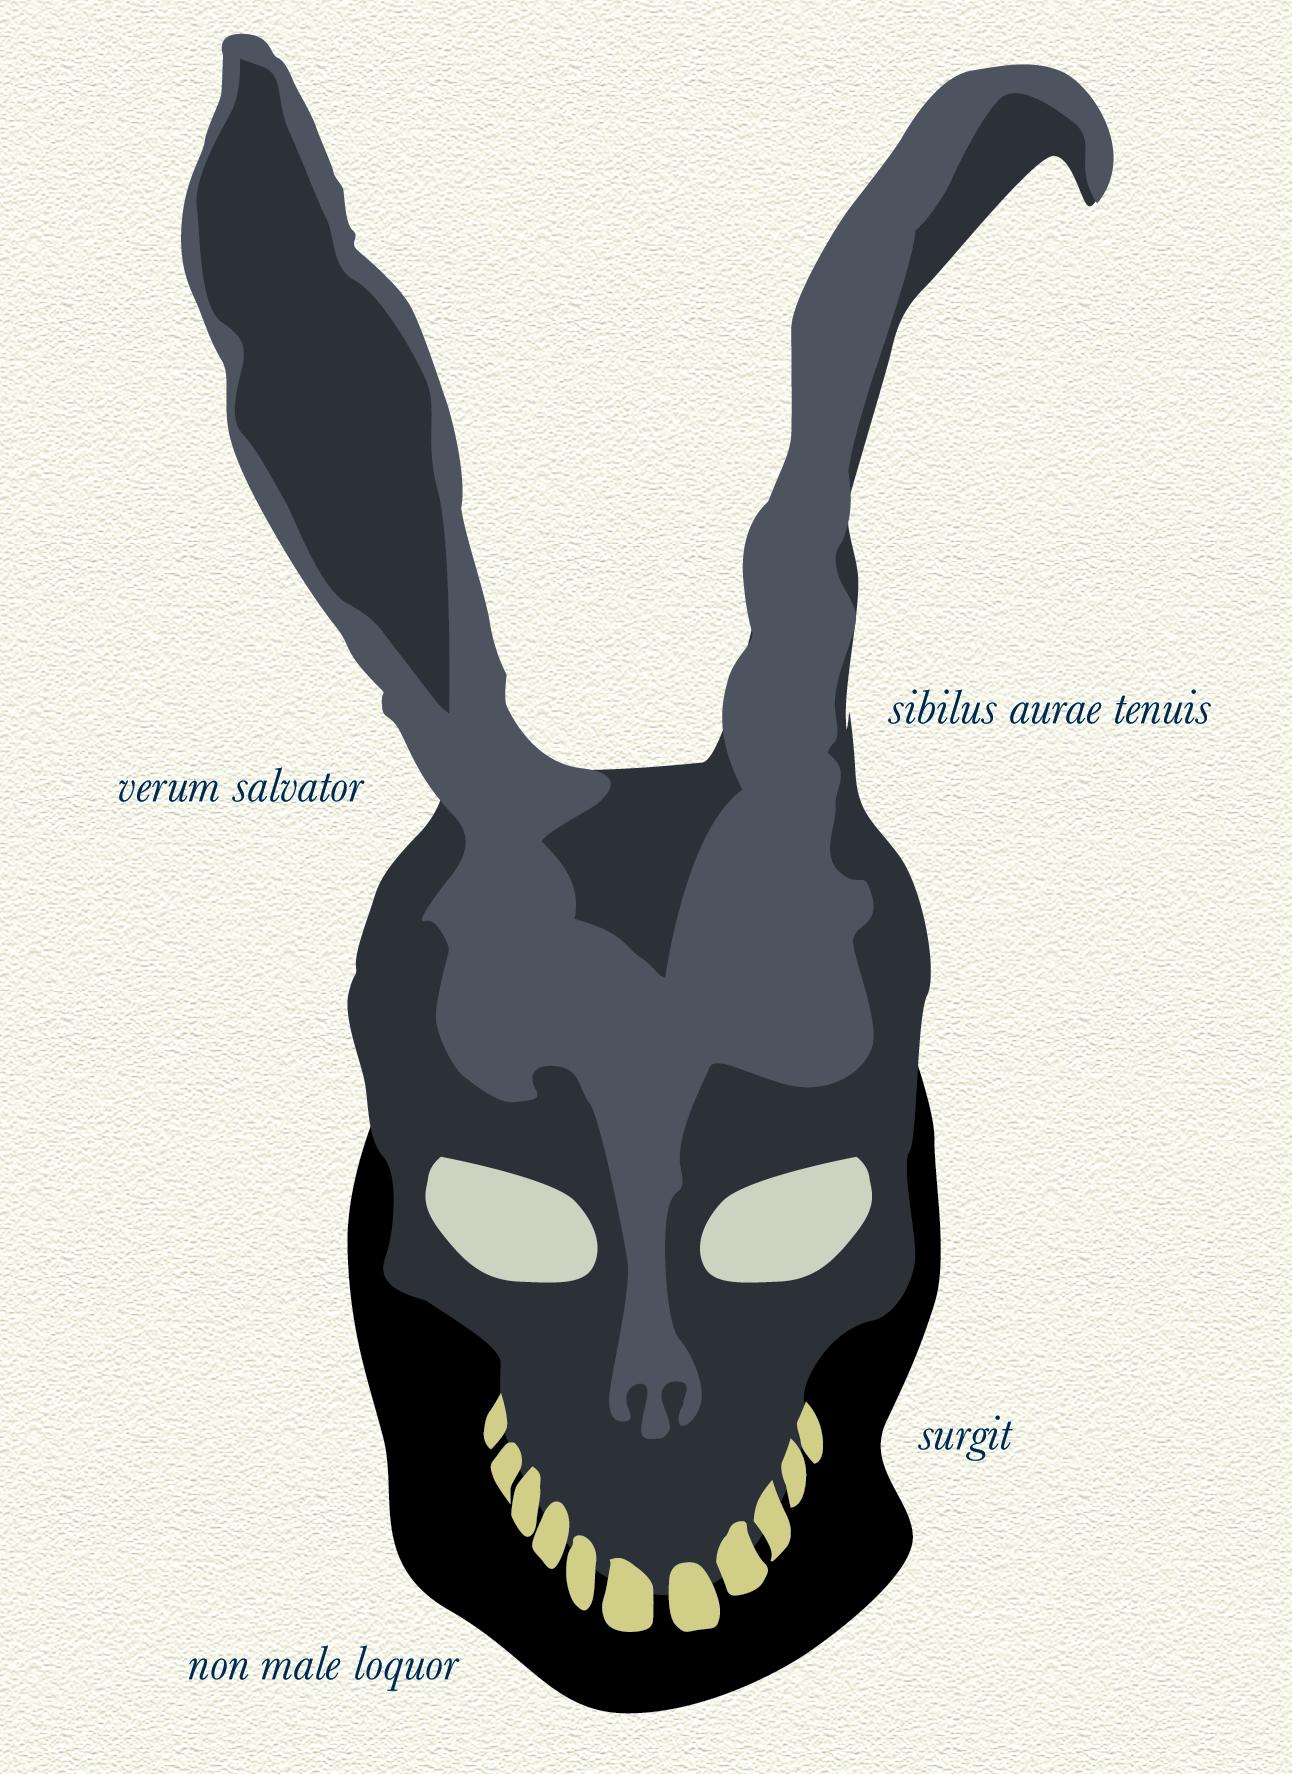 Donnie Darko - Promo Illustration